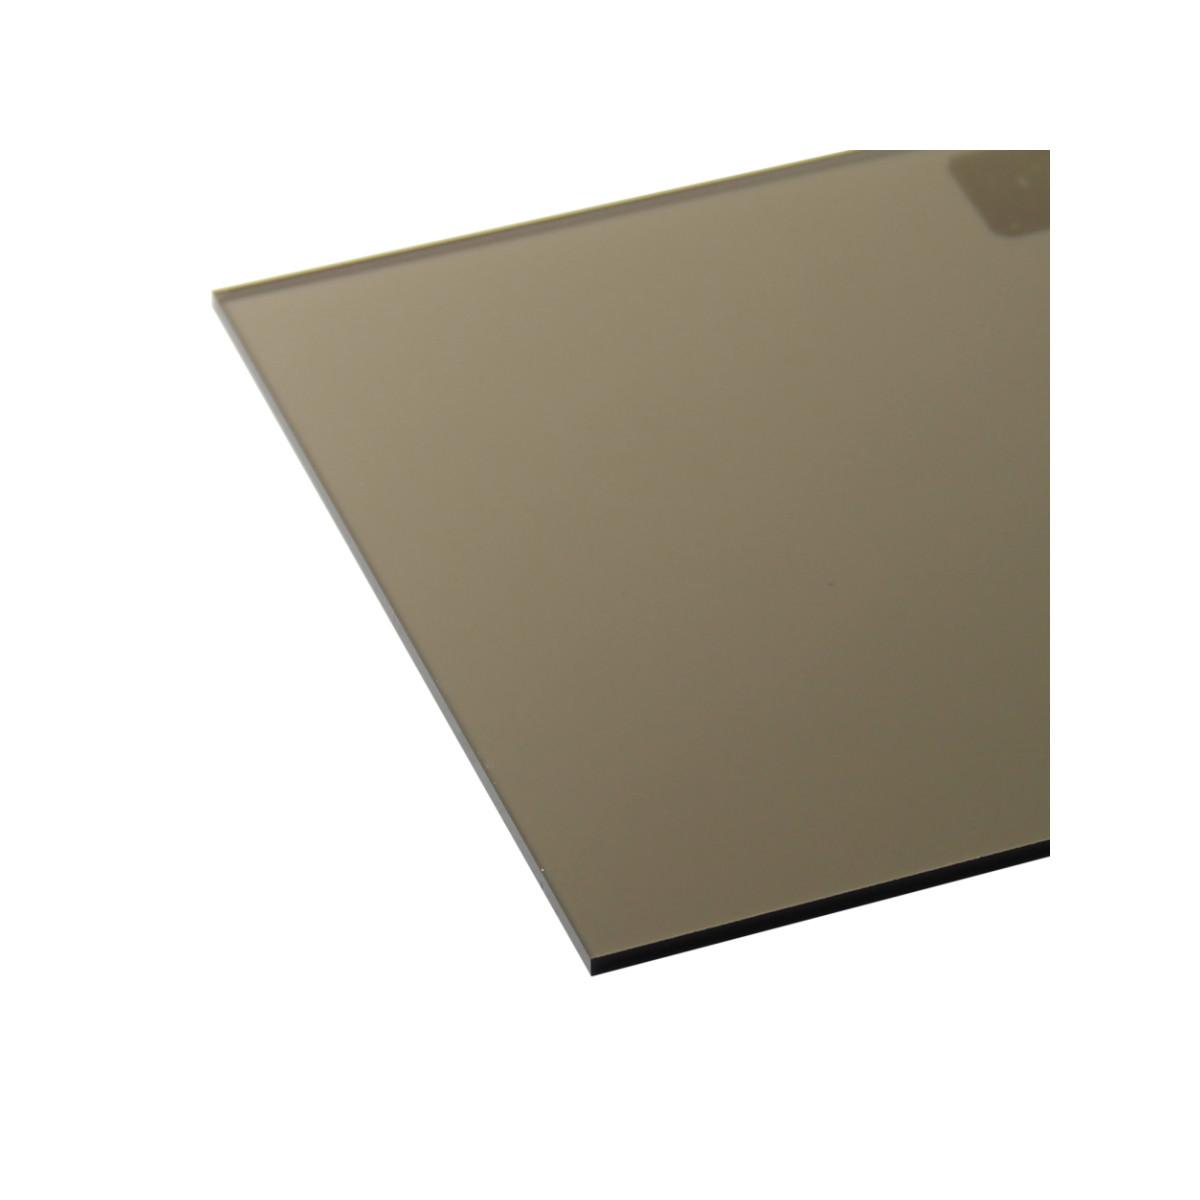 Поликарбонат монолитный 2 мм 2.05х3.05 м цвет бронза